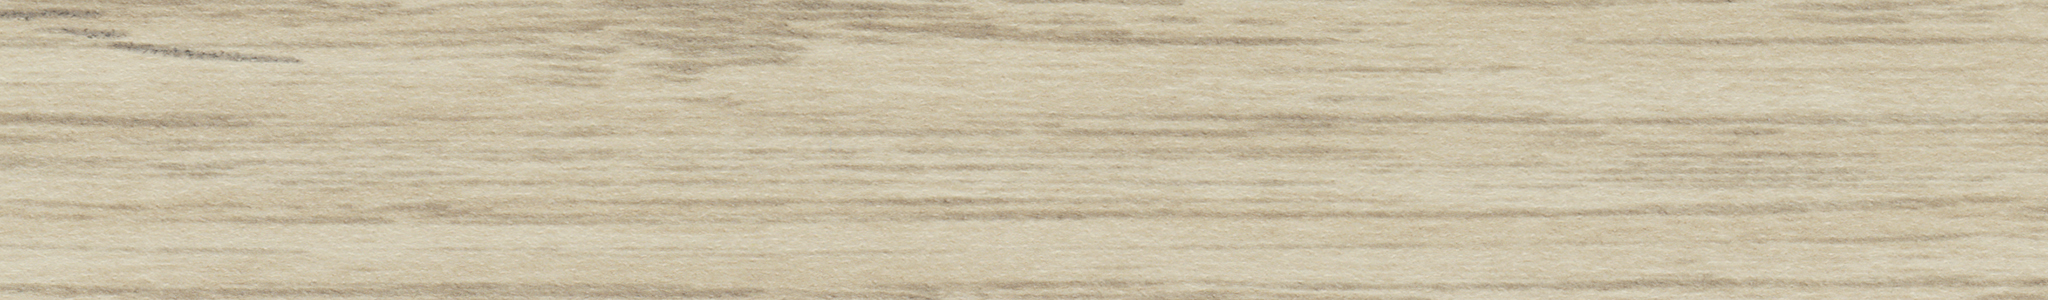 HD 290411 ABS hrana Albatros perla